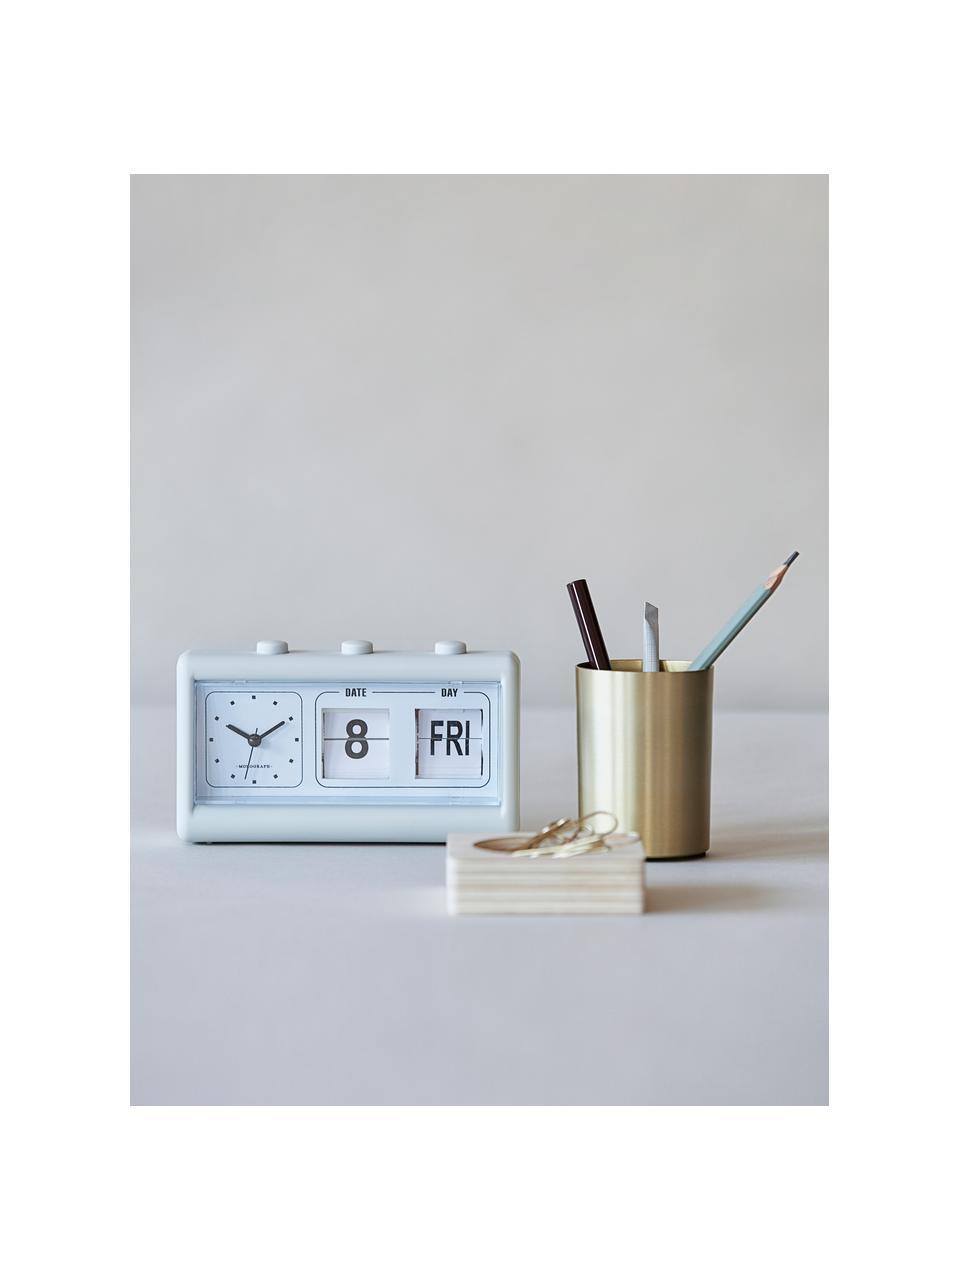 Wecker Retro, Gehäuse: PVC, Hellgrau, 19 x 11 cm